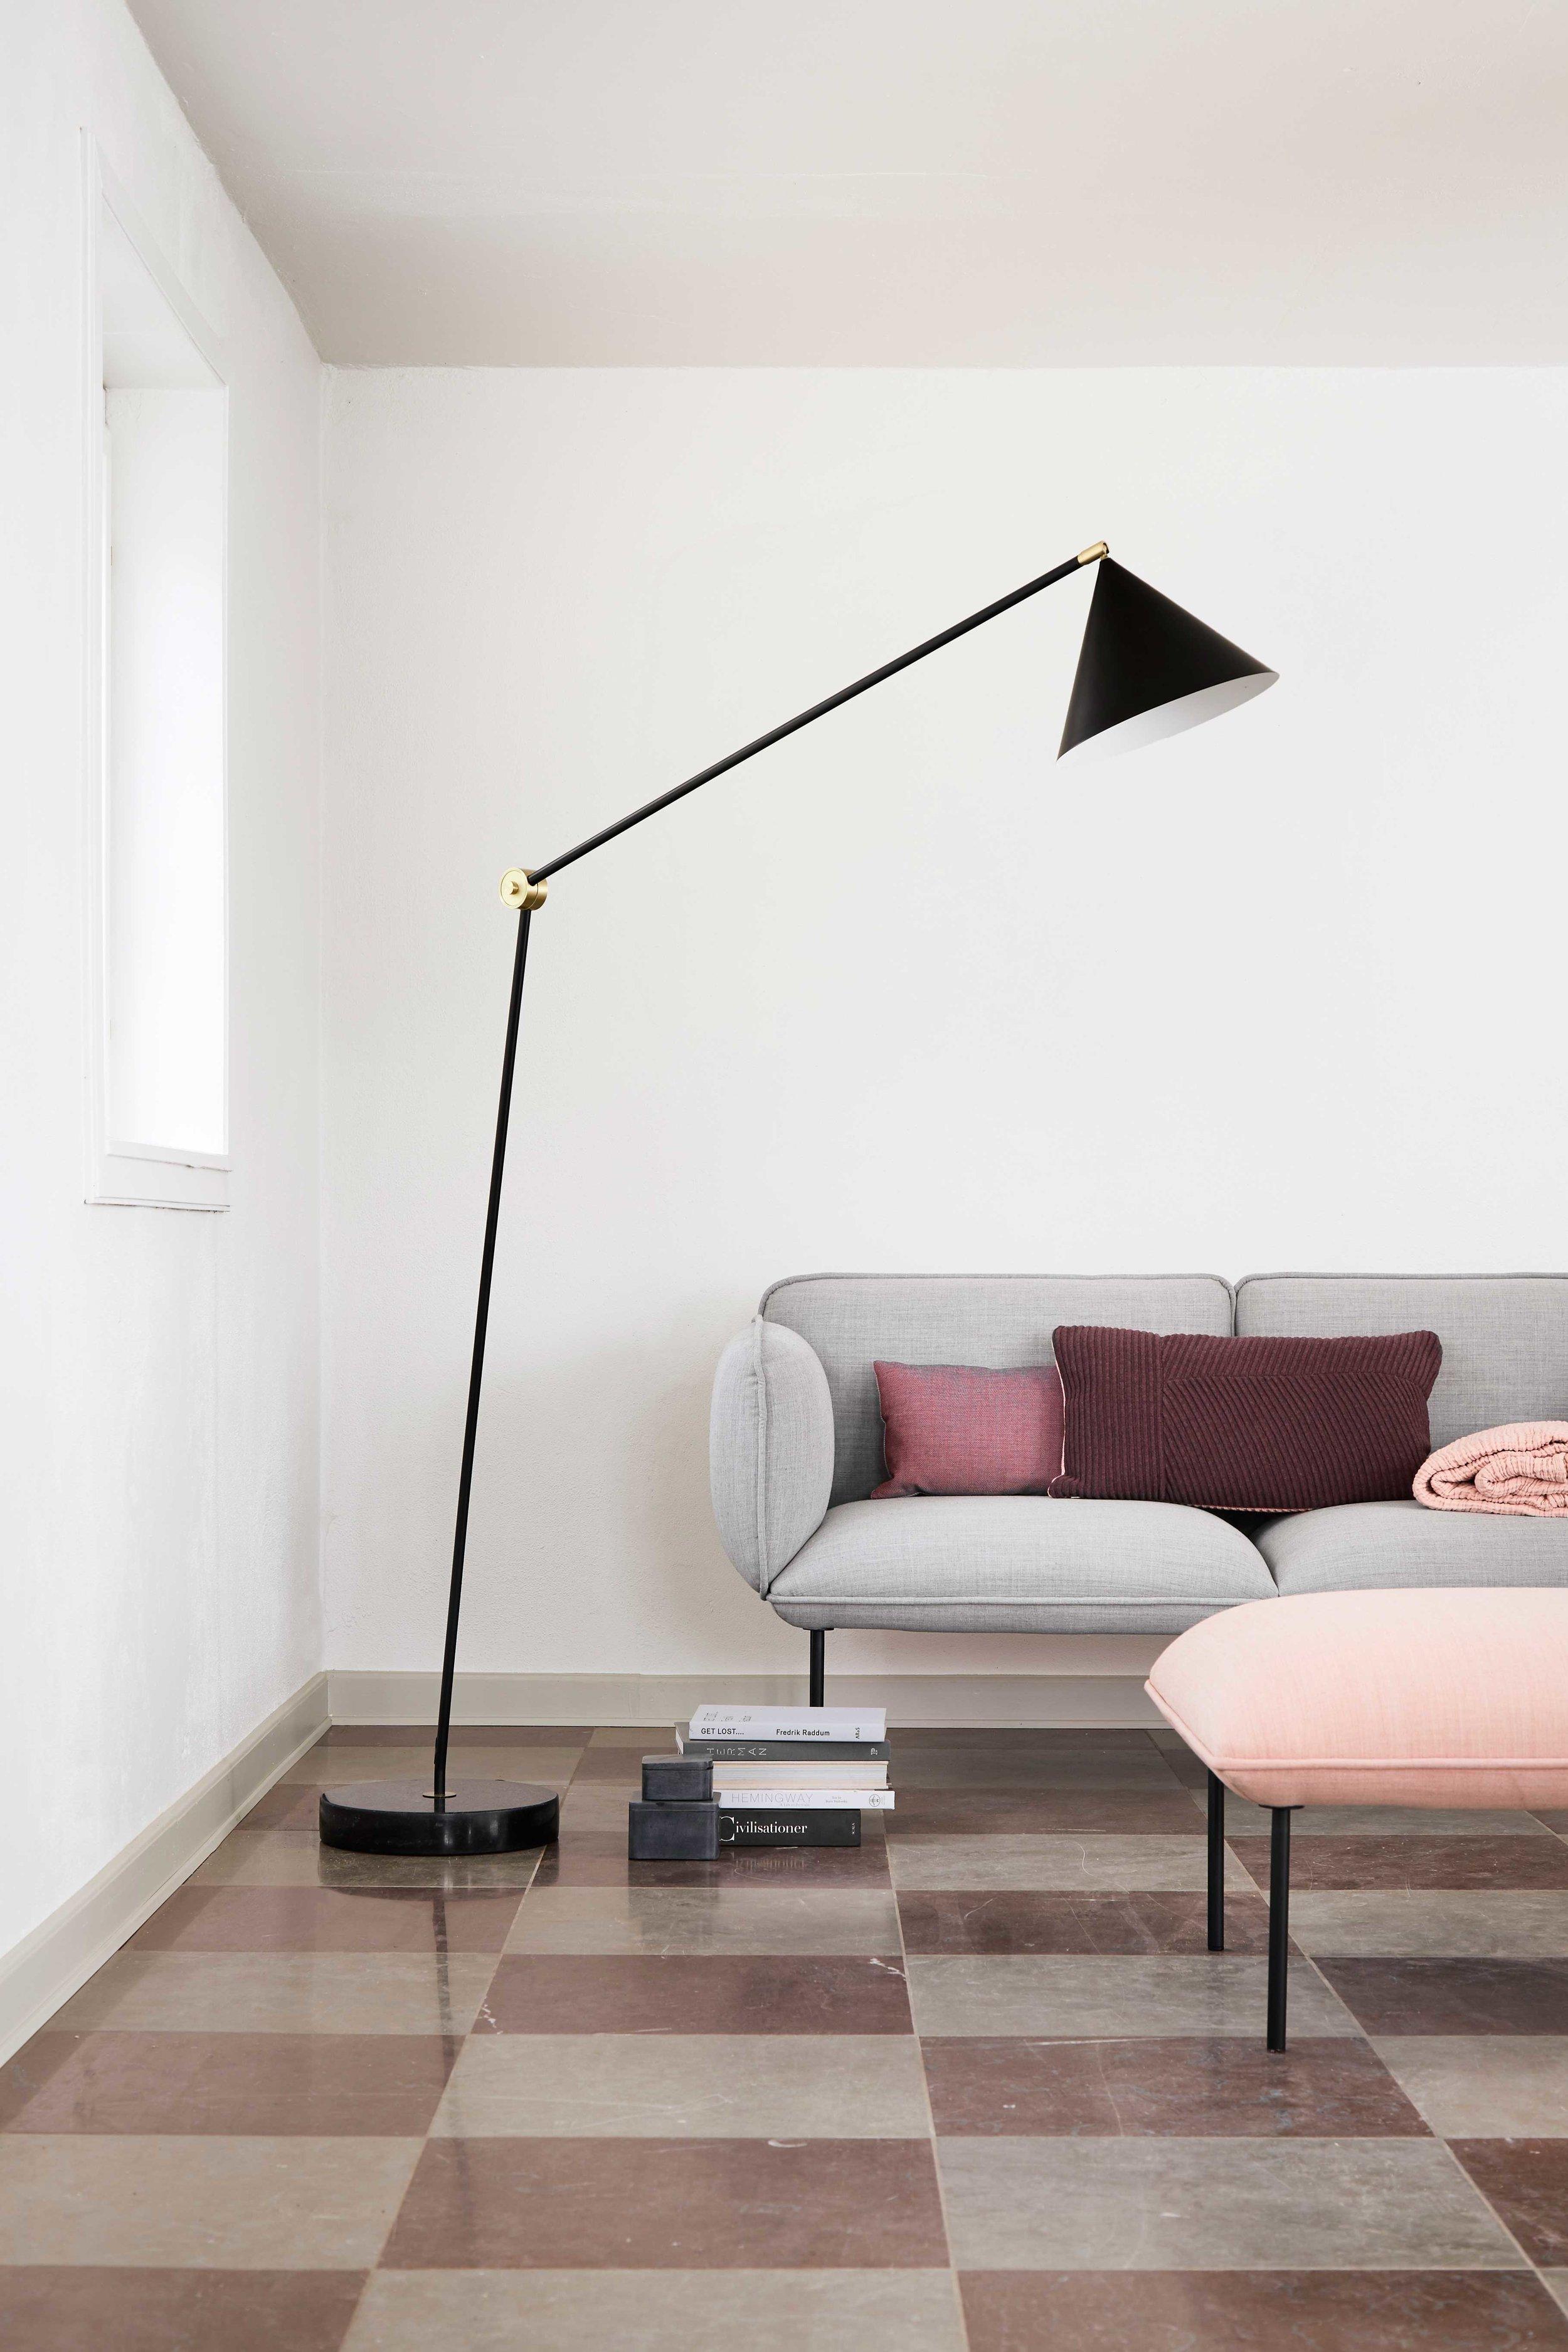 Benjamin-floor-lamp-black-matt---lifestyle-Tirsbæk-Gods-63350.jpg